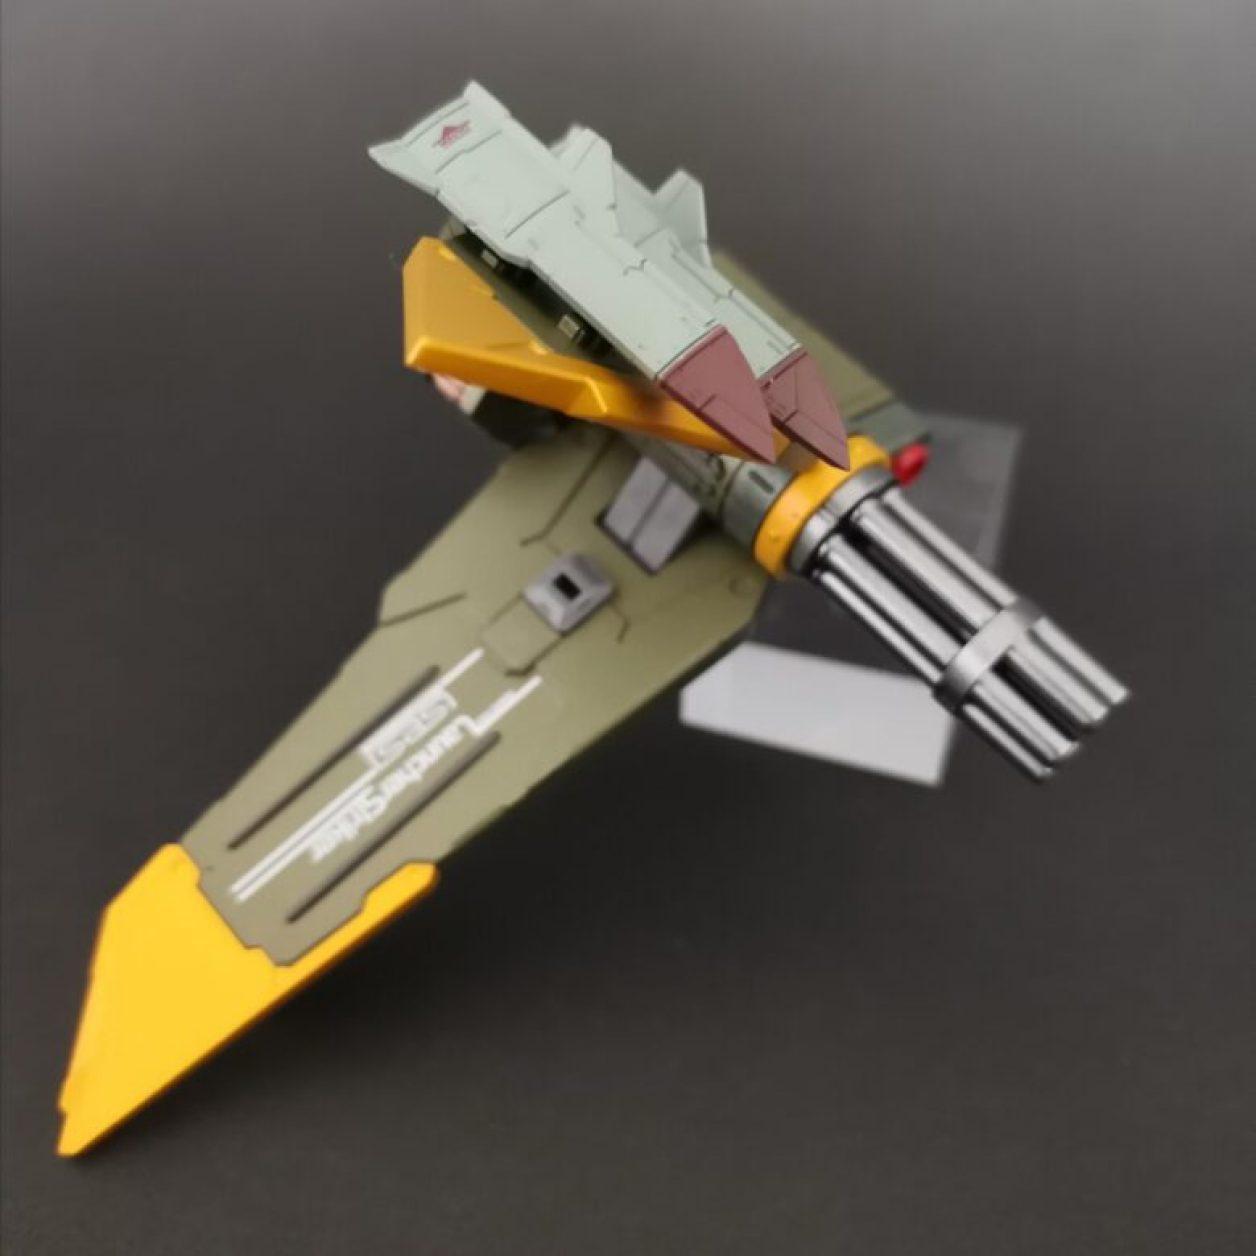 METALBUILD (メタルビルド)のランチャーストライカー付属品のコンボウェポンポッドにクルーザーミサイルをマウントした状態の画像